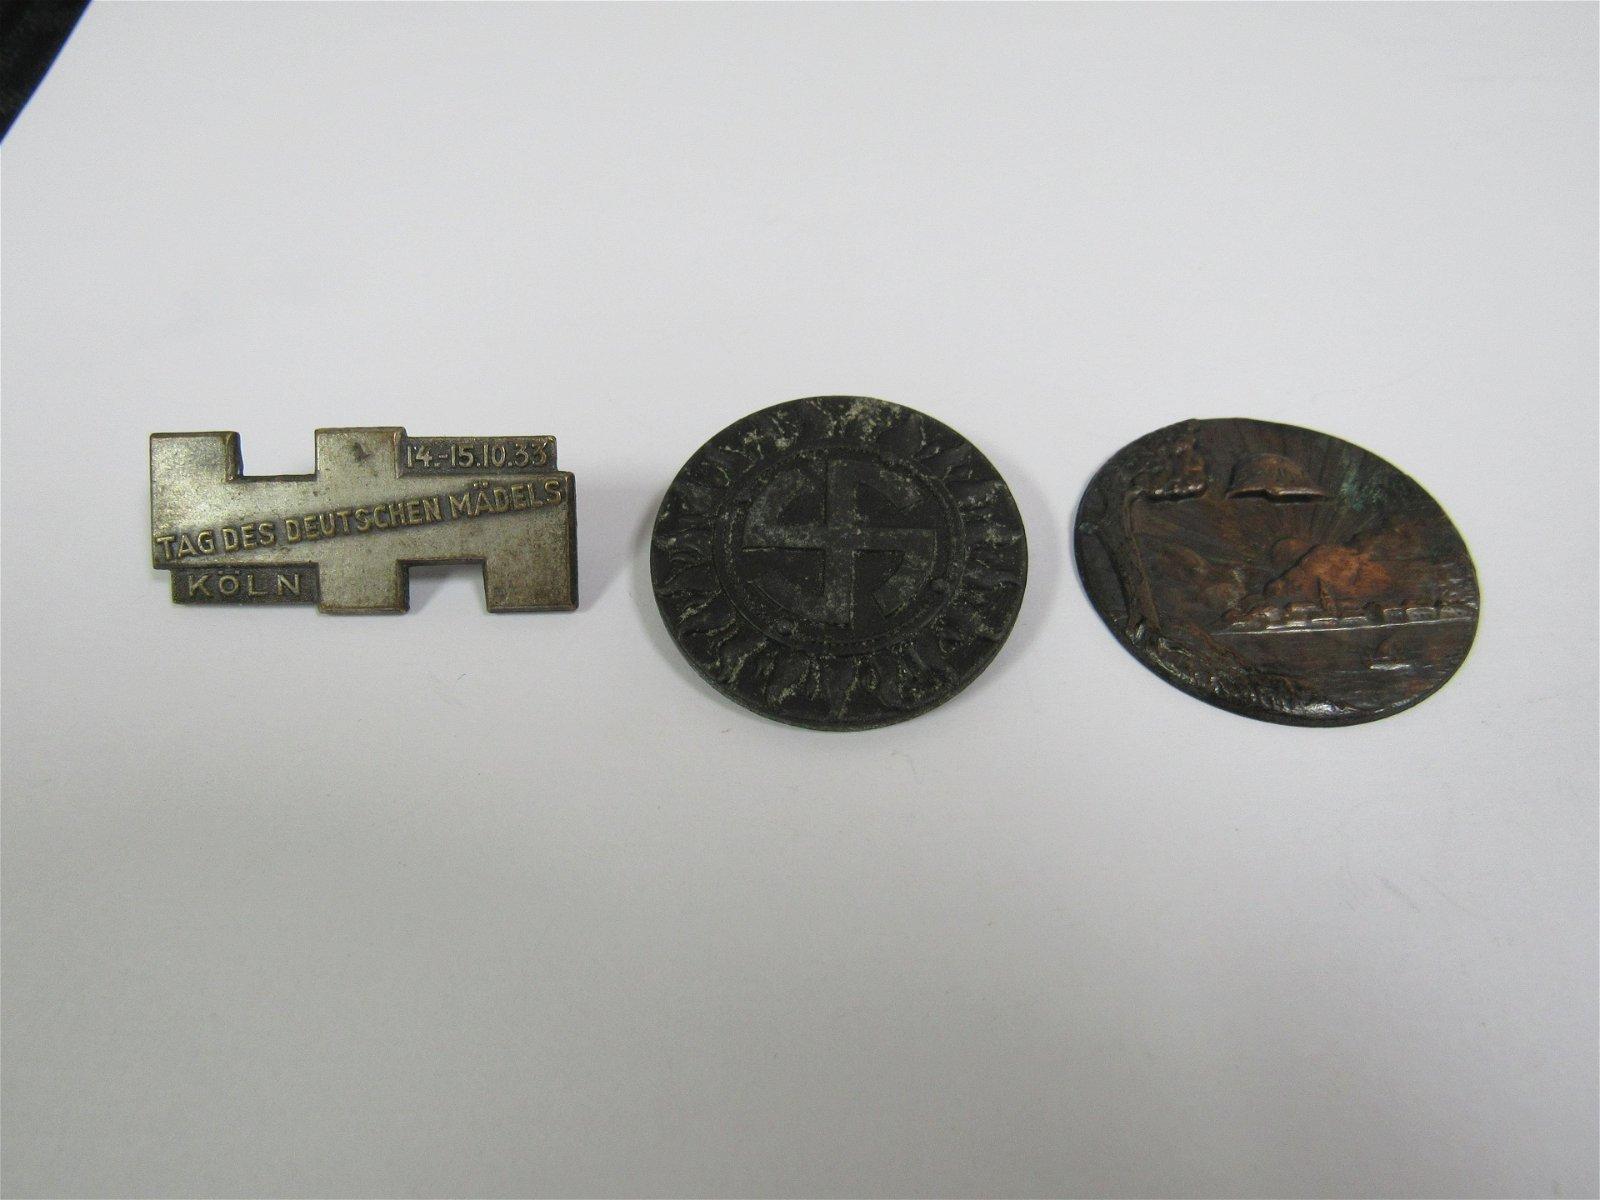 Lot of 3 WWII Nazi Germany Medals. Tag Des Deutschen